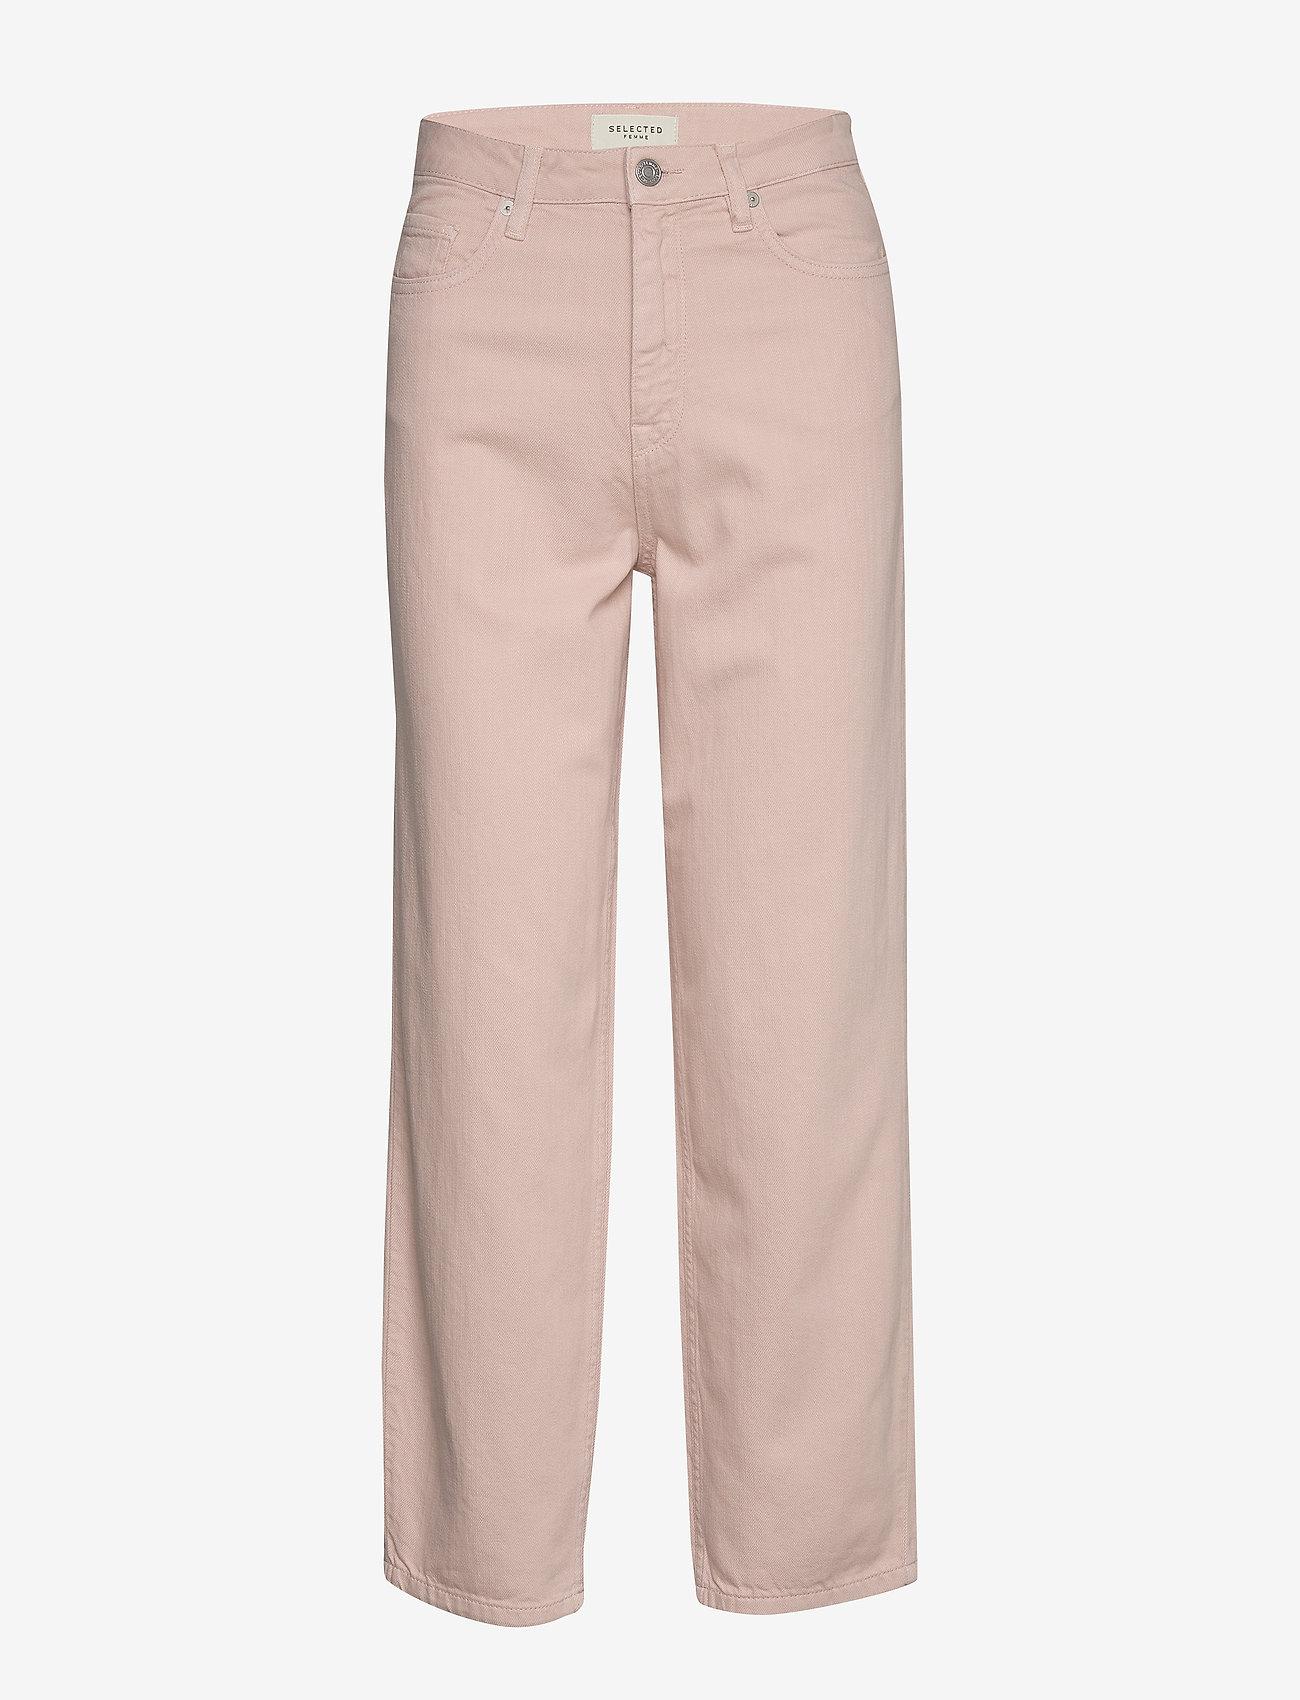 Selected Femme - SLFELLI HW LIGHT PINK VOLUME JEANS W - pantalons larges - potpourri - 0